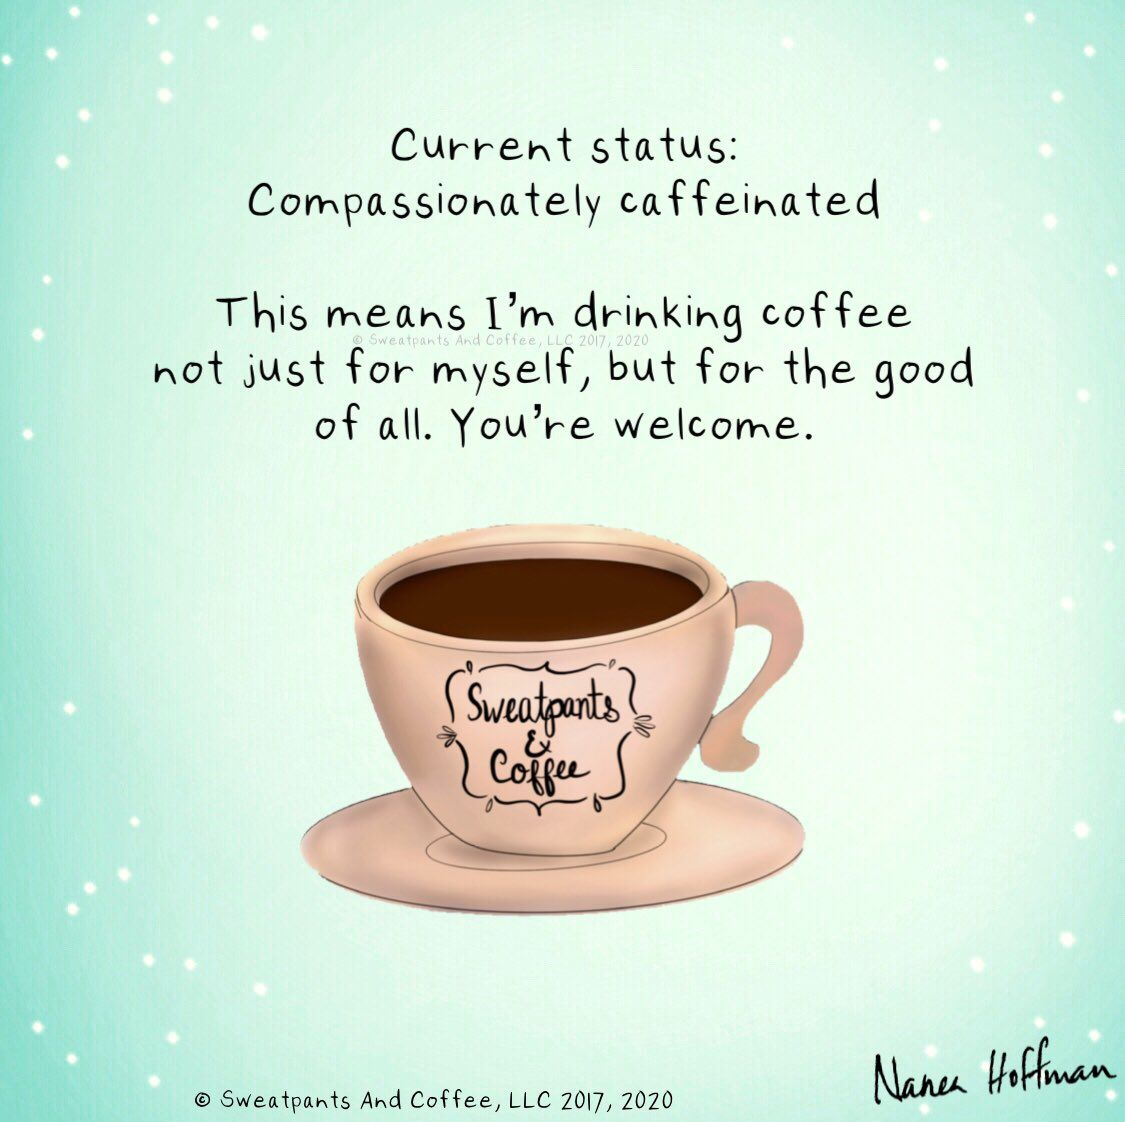 Sweatpants Coffee On Twitter In 2021 Coffee Quotes Morning Coffee Meme Coffee Humor